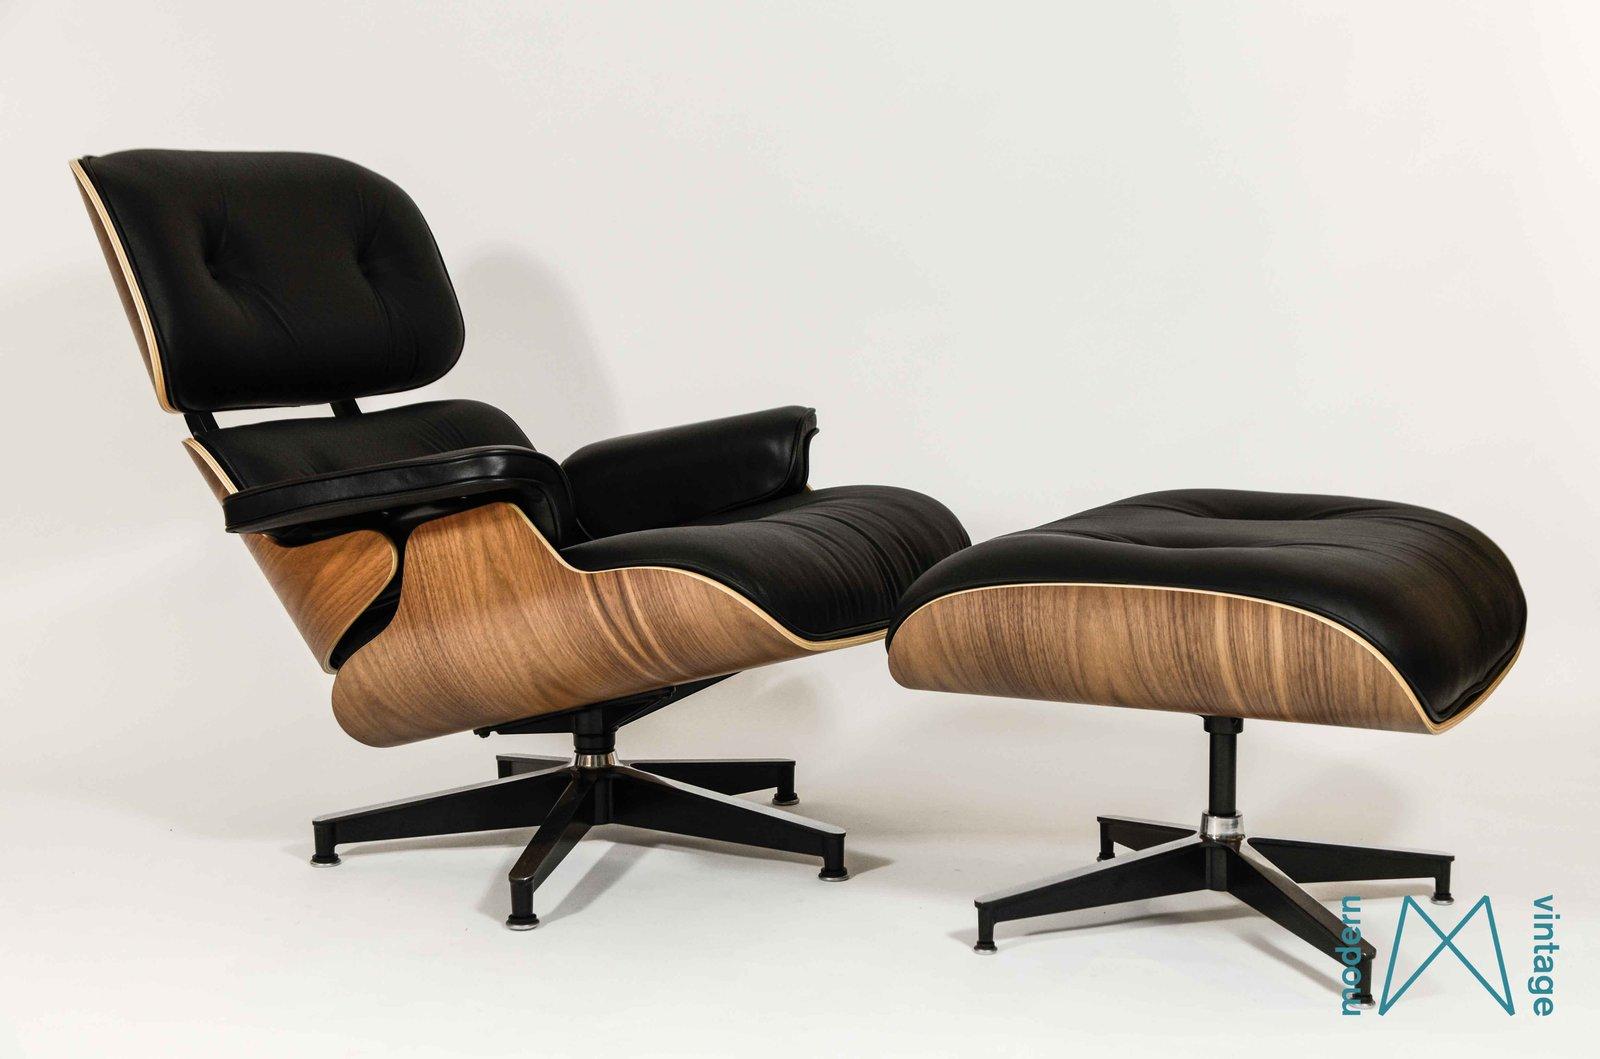 Eames Chair Original modern vintage amsterdam original eames furniture home